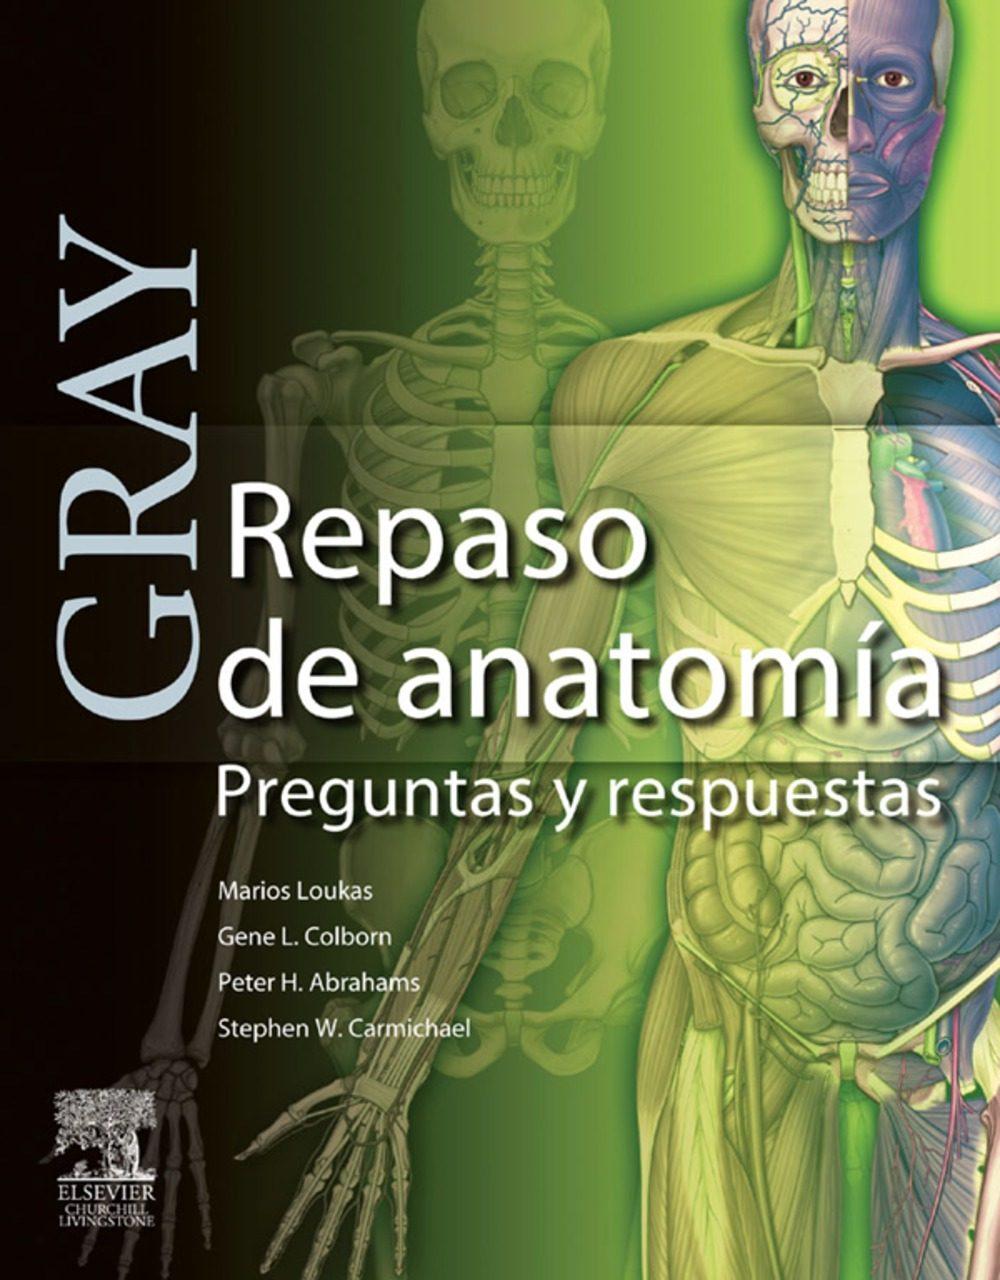 GRAY. REPASO DE ANATOMÍA EBOOK | M. LOUKAS | Descargar libro PDF o ...